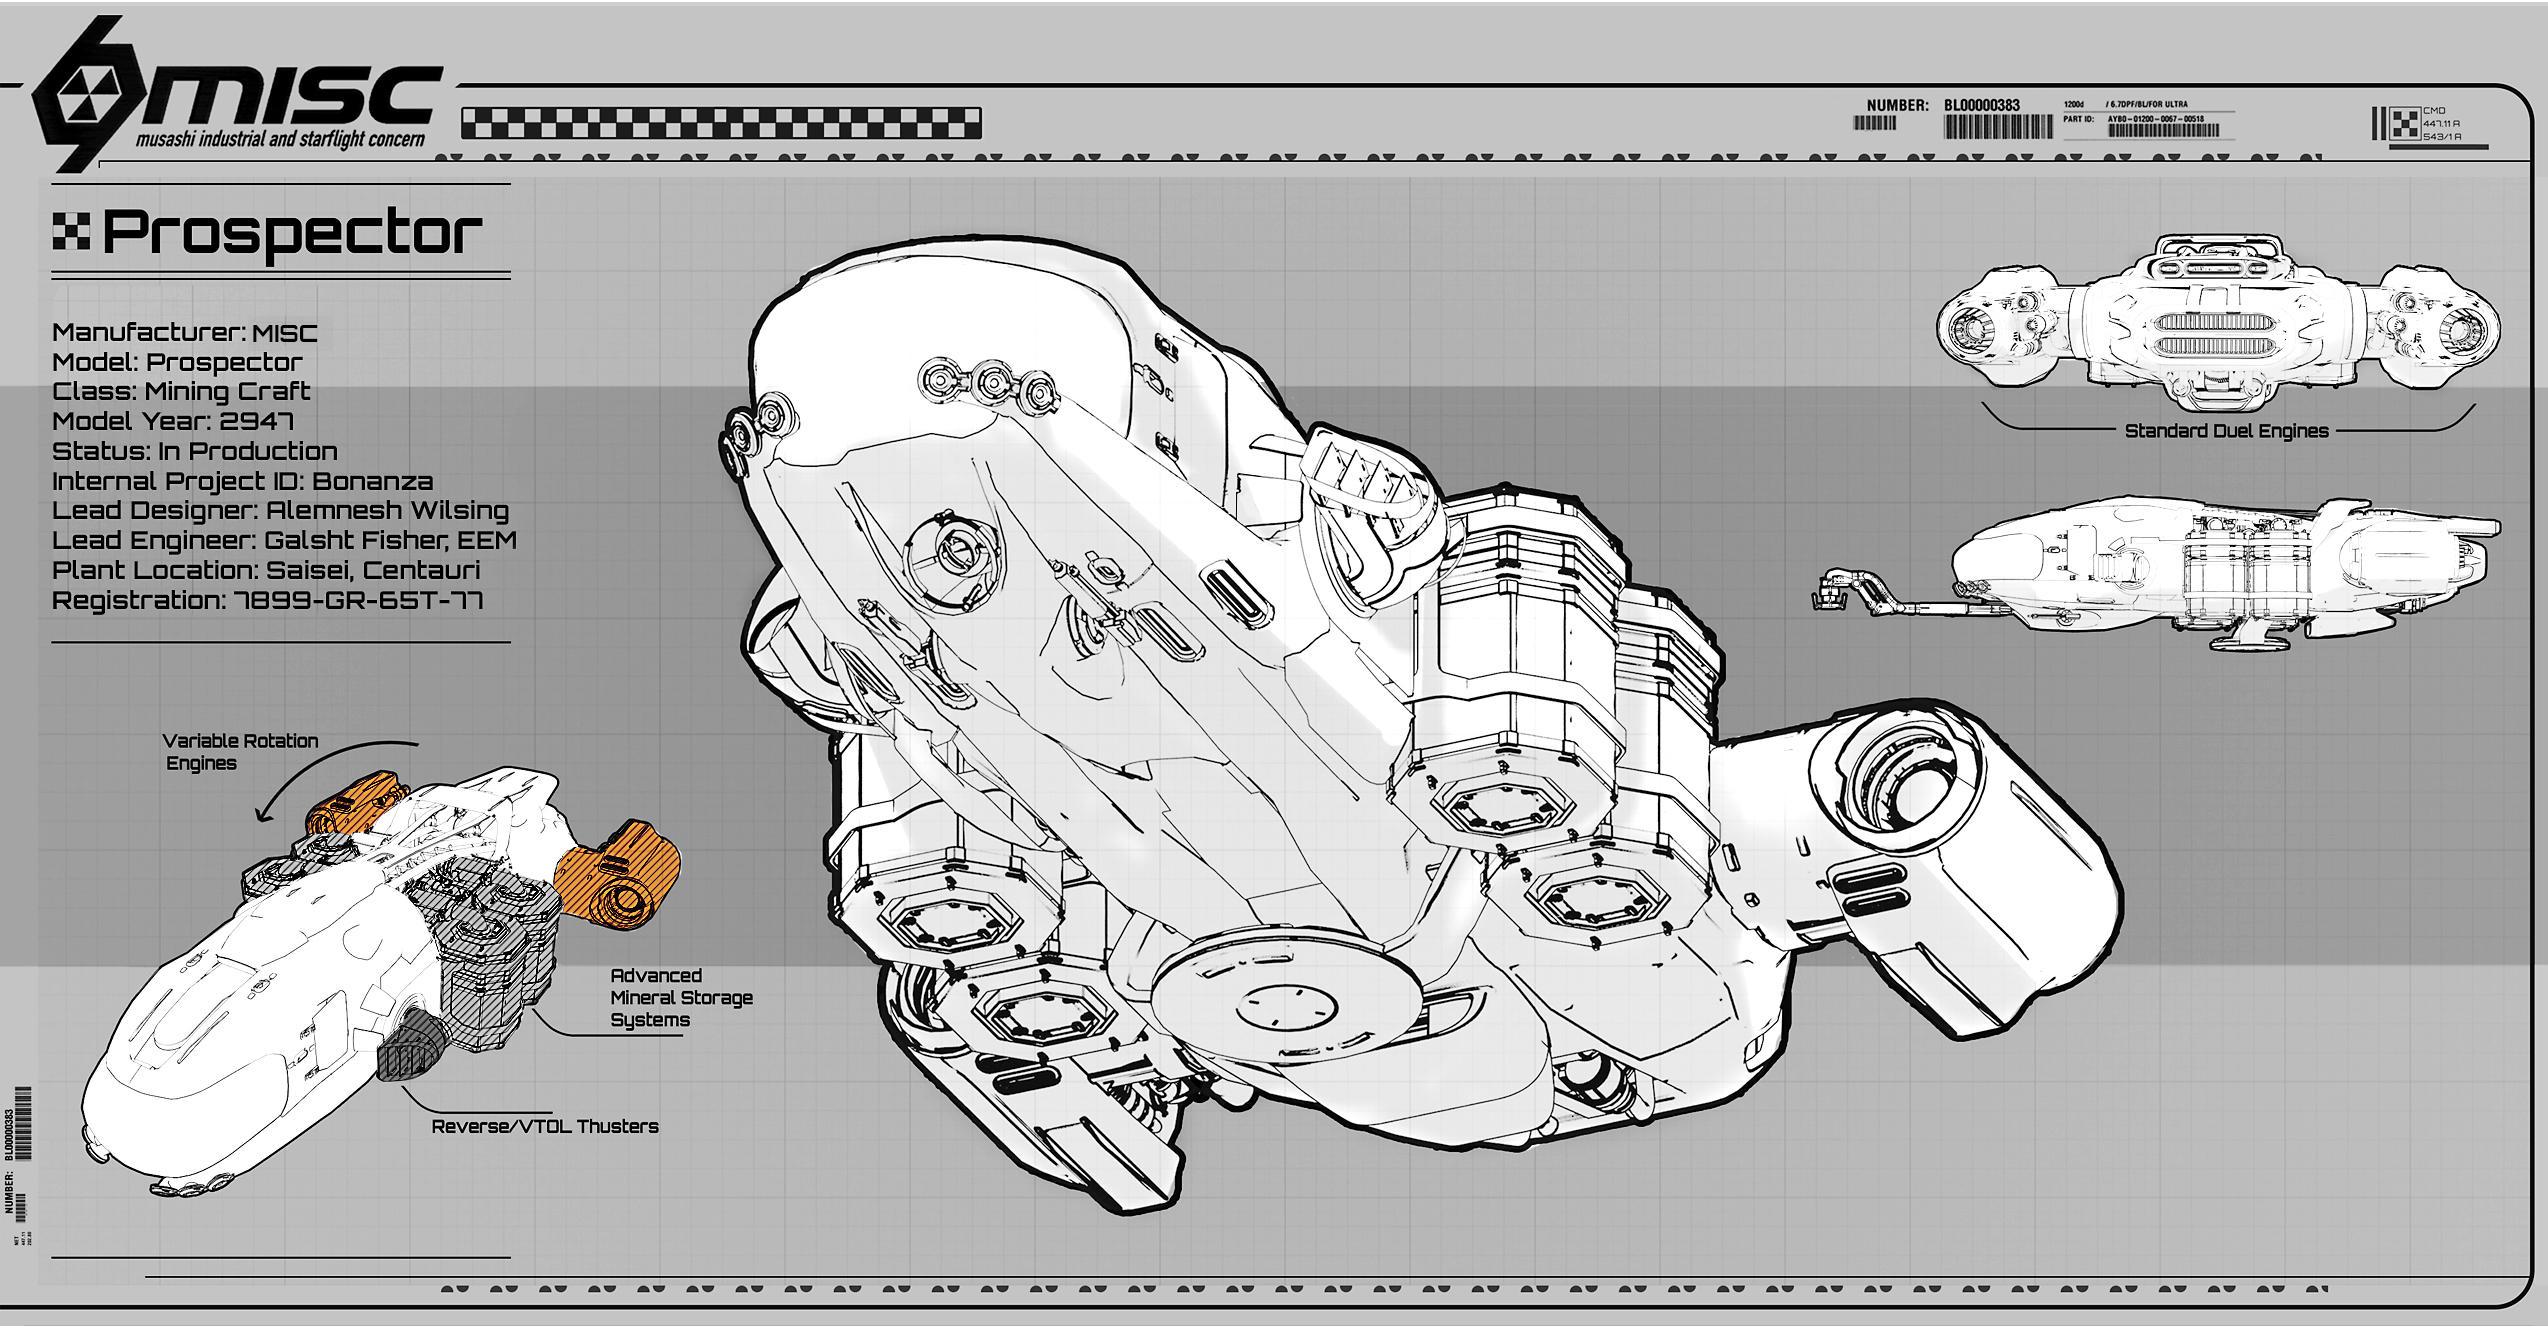 MISC Prospector Blueprint 2.jpg